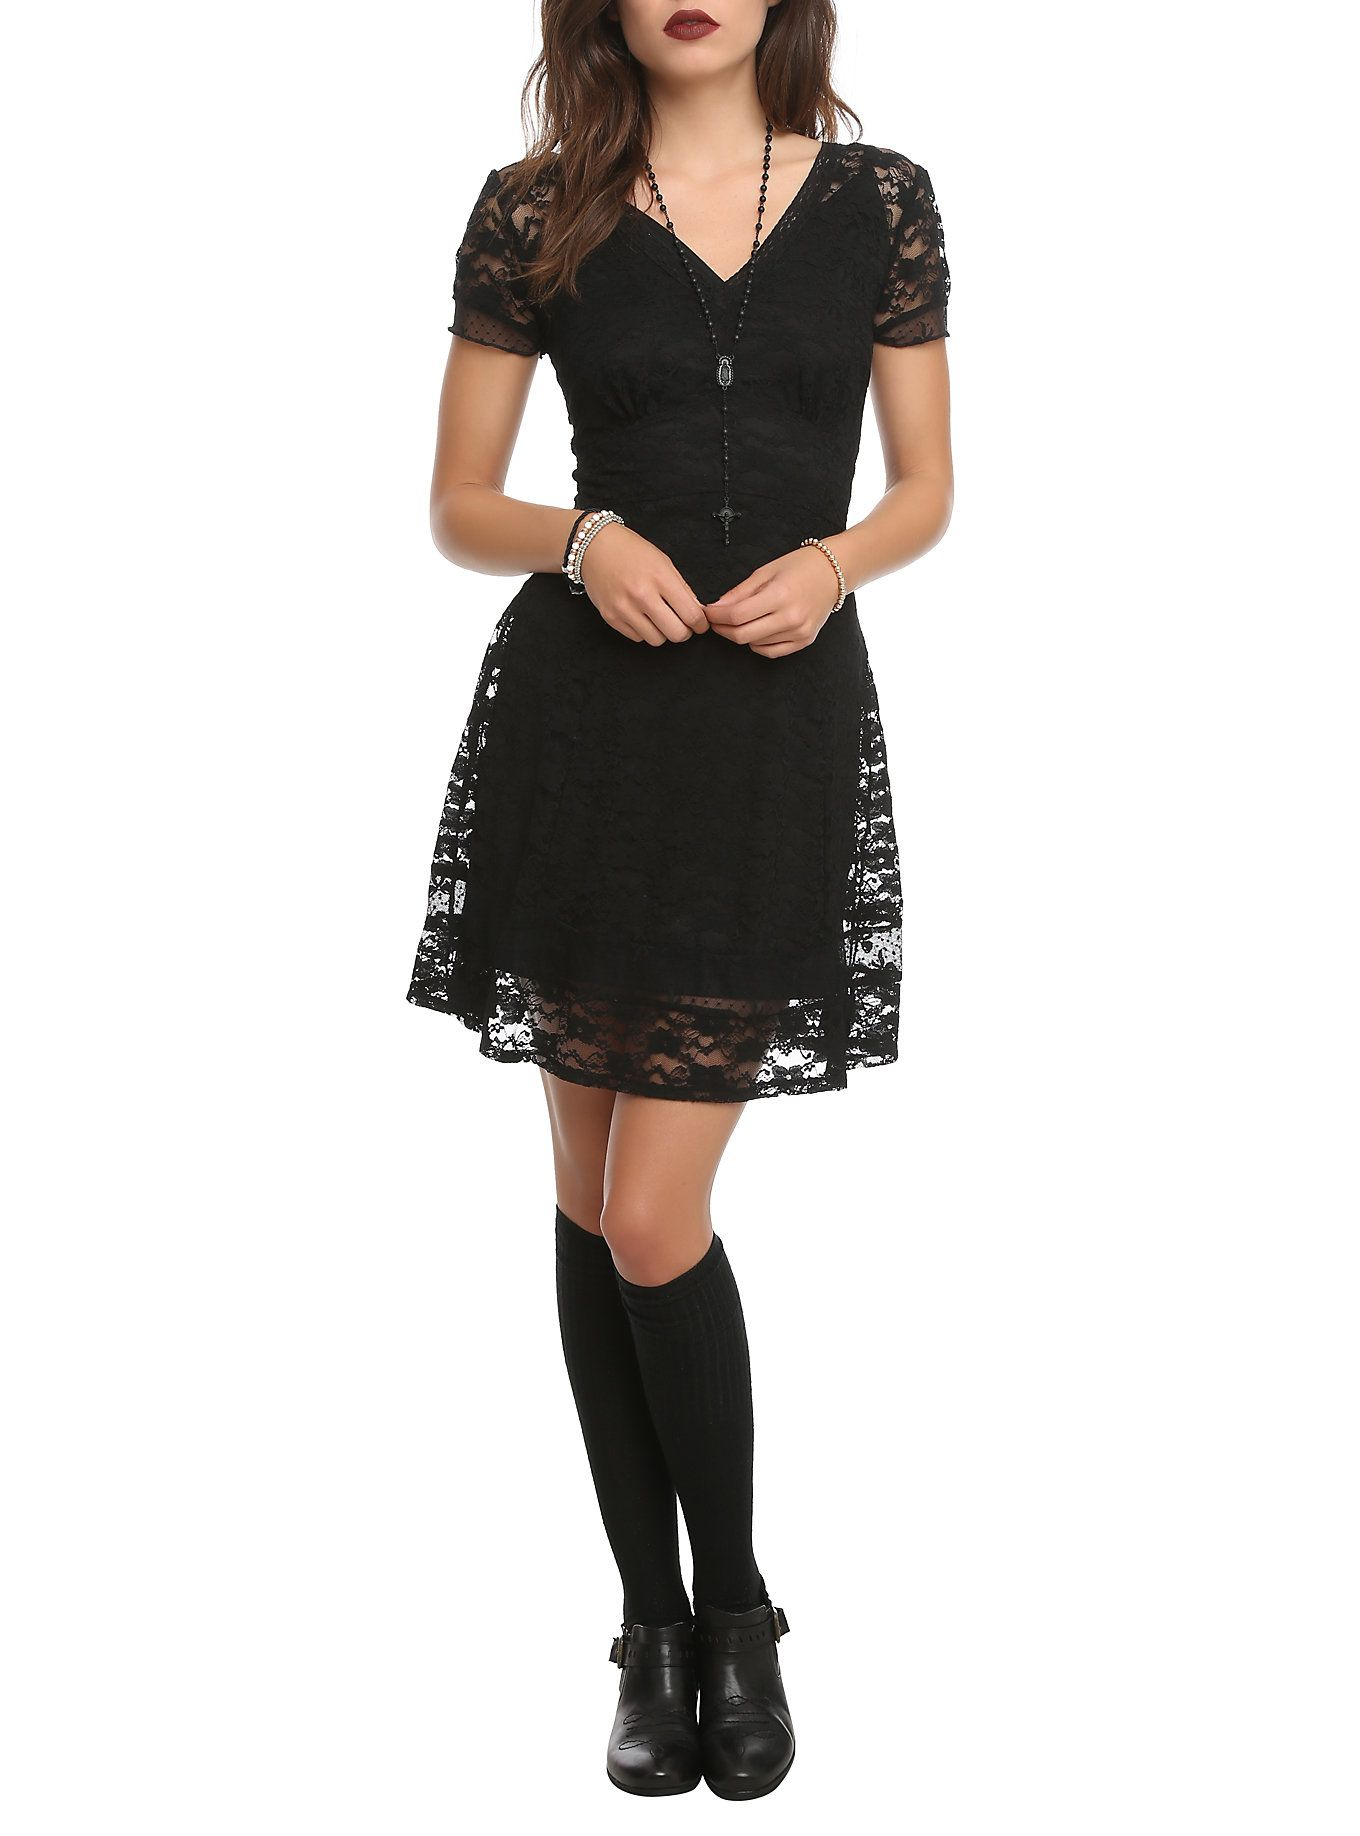 Royal bones by tripp black lace dress lace dress black lace dress